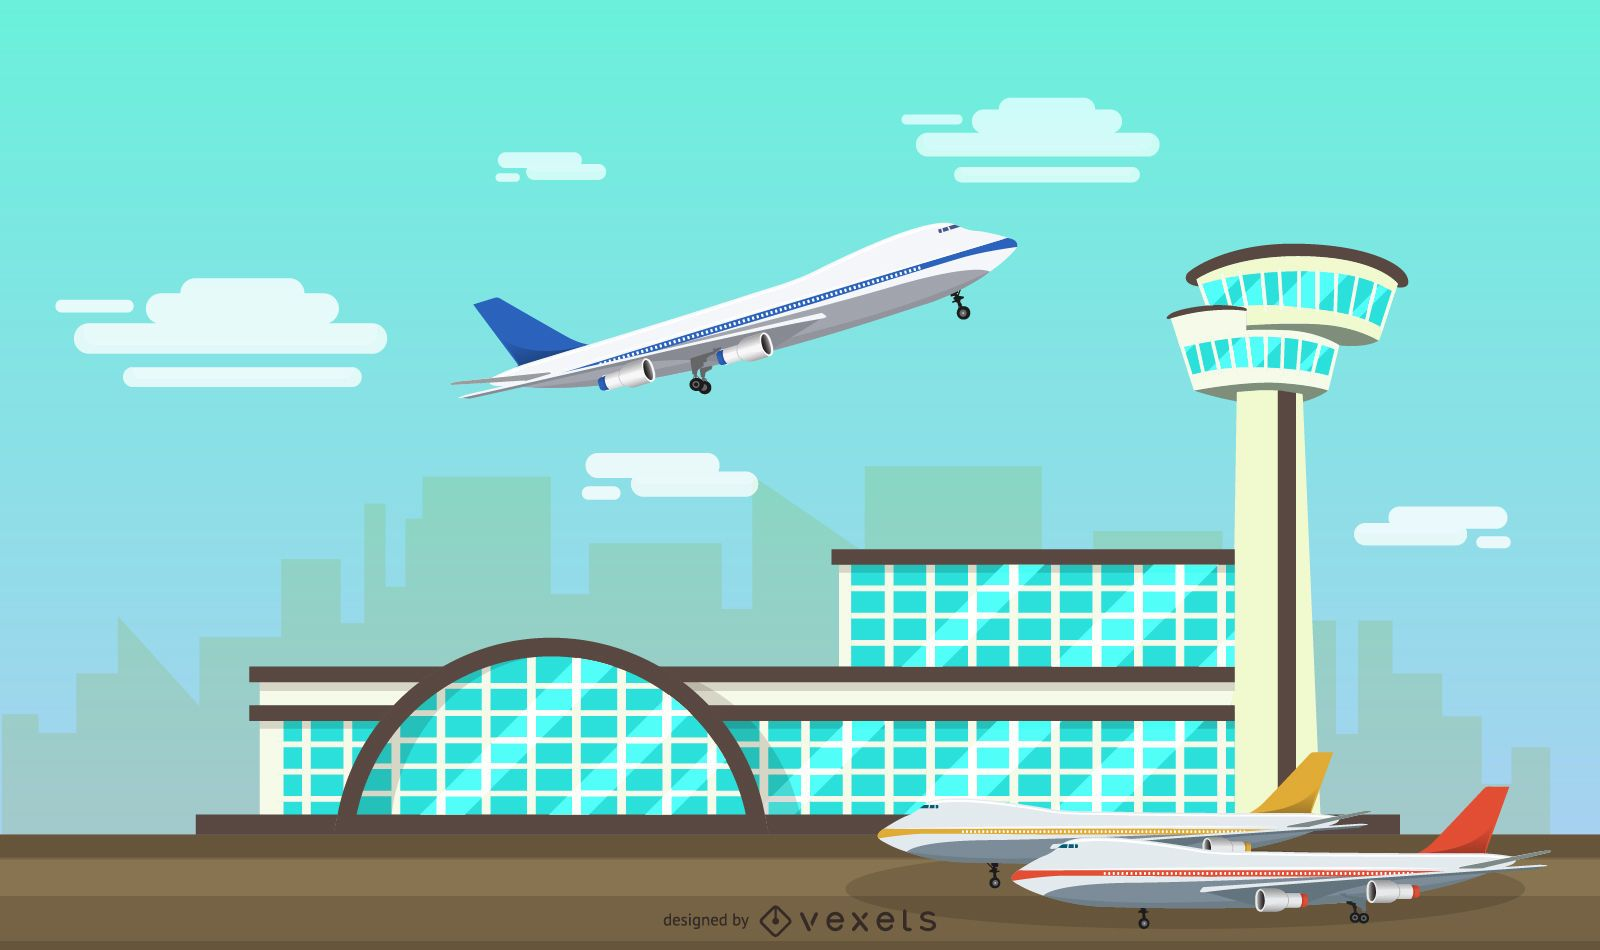 Flat airport facility illustration